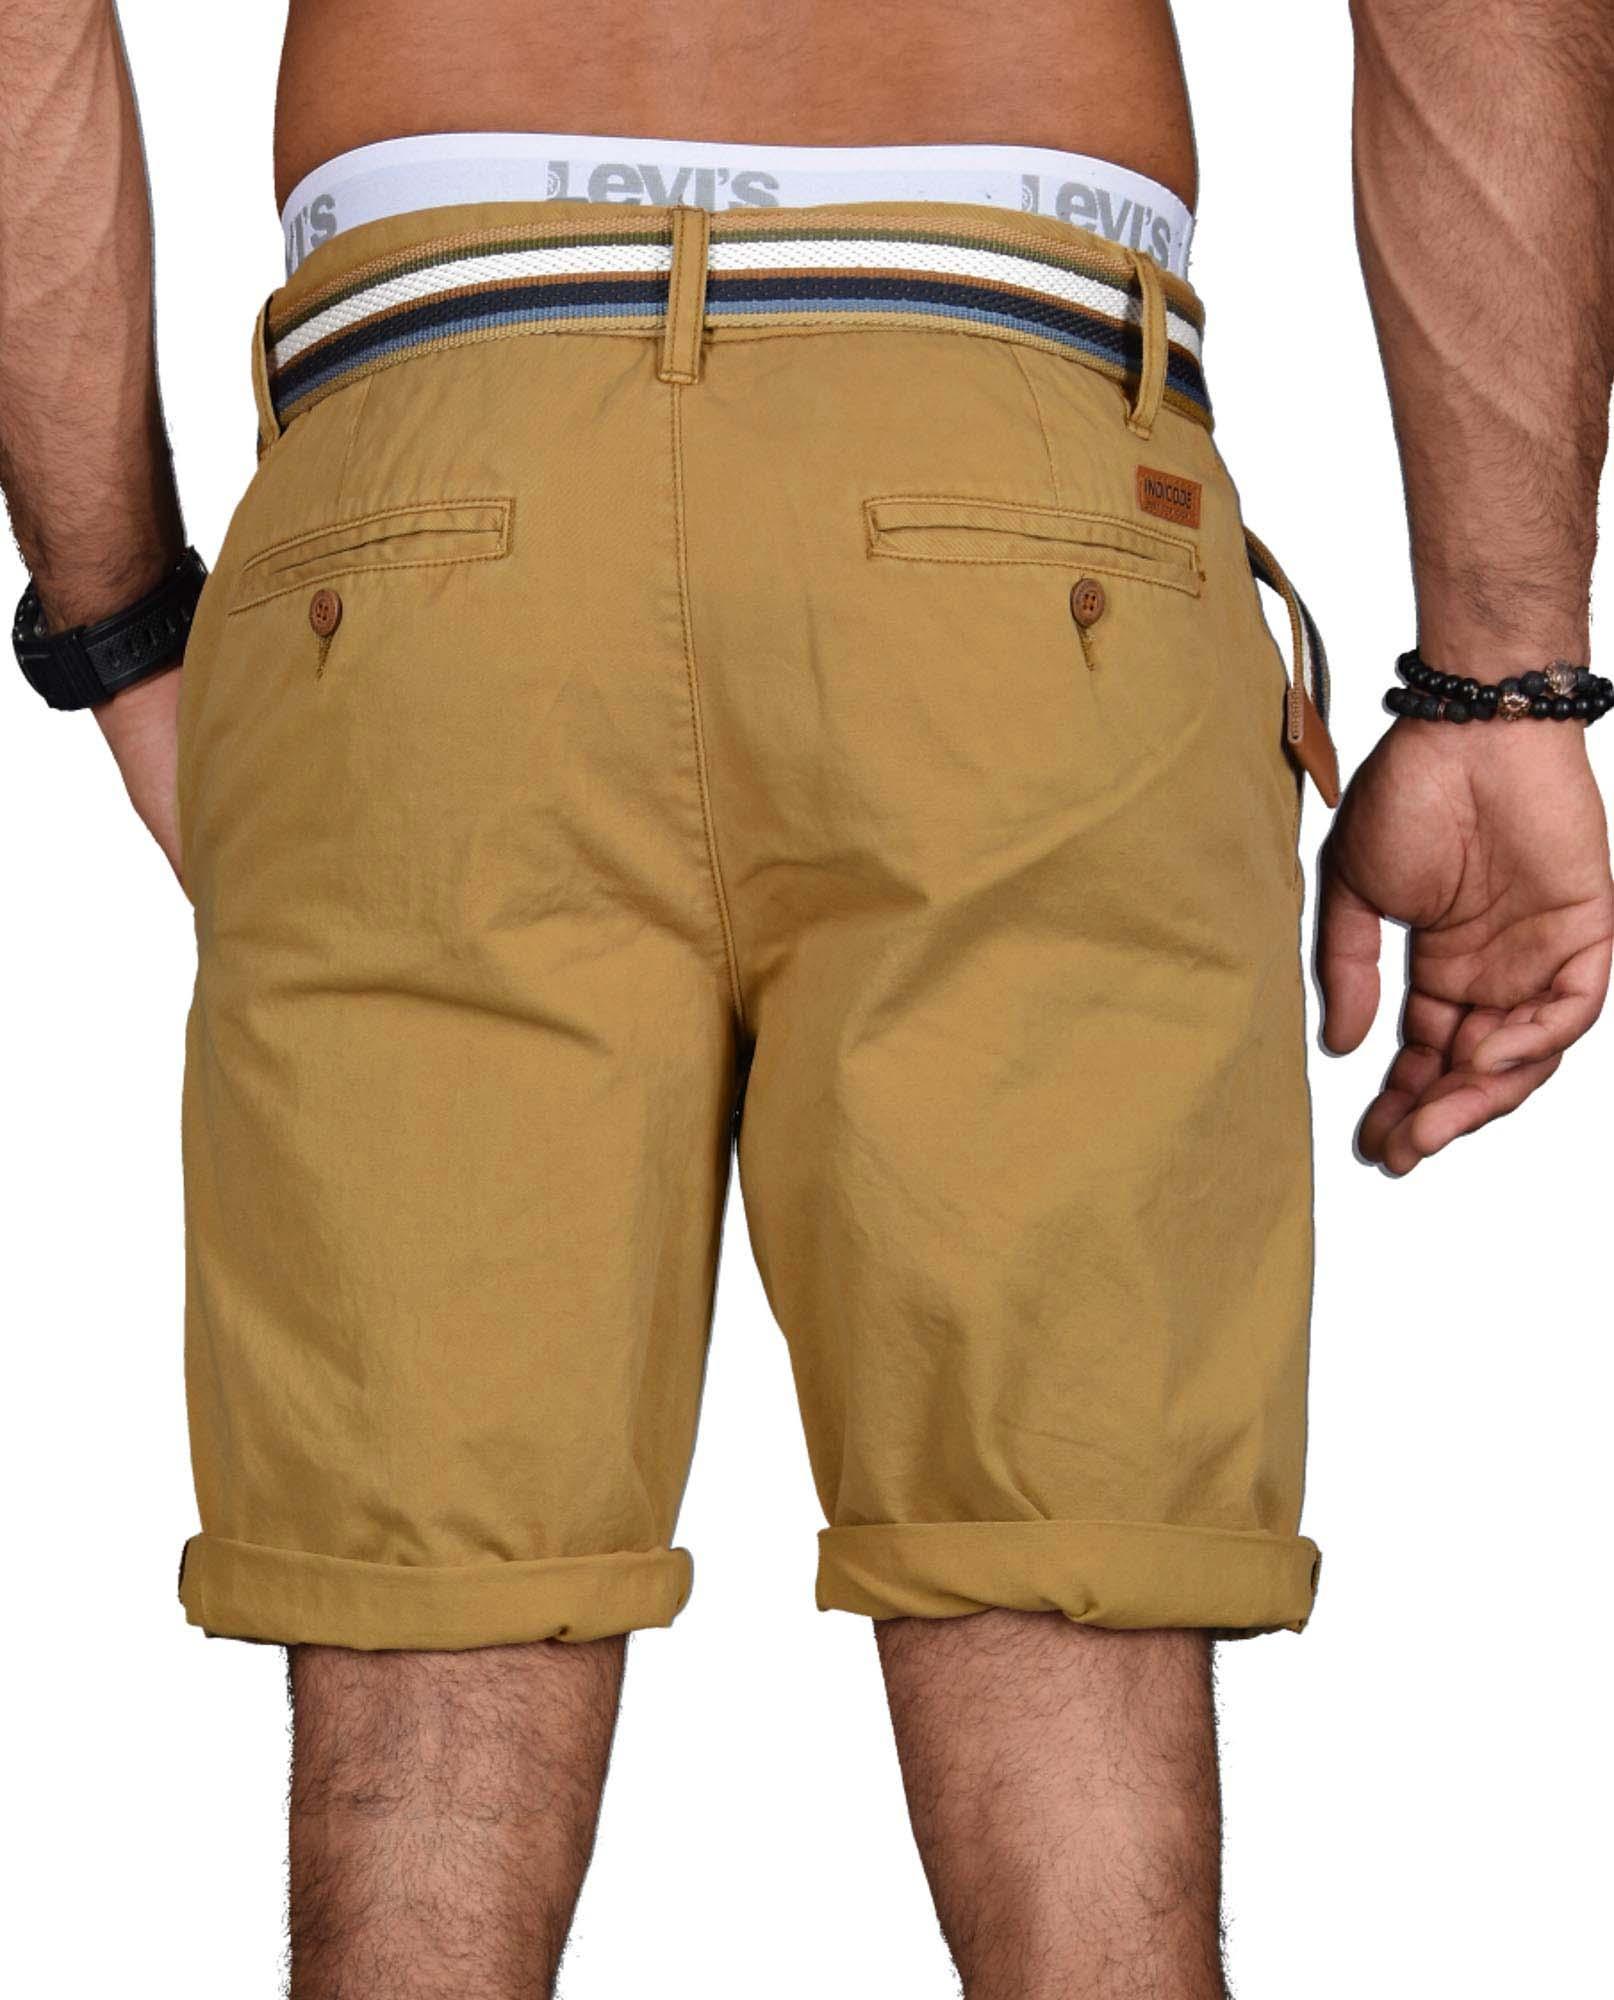 Indicode-Herren-Sommer-Bermuda-Chino-Shorts-kurze-Hose-Sommerhose-Short-NEU-B499 Indexbild 9